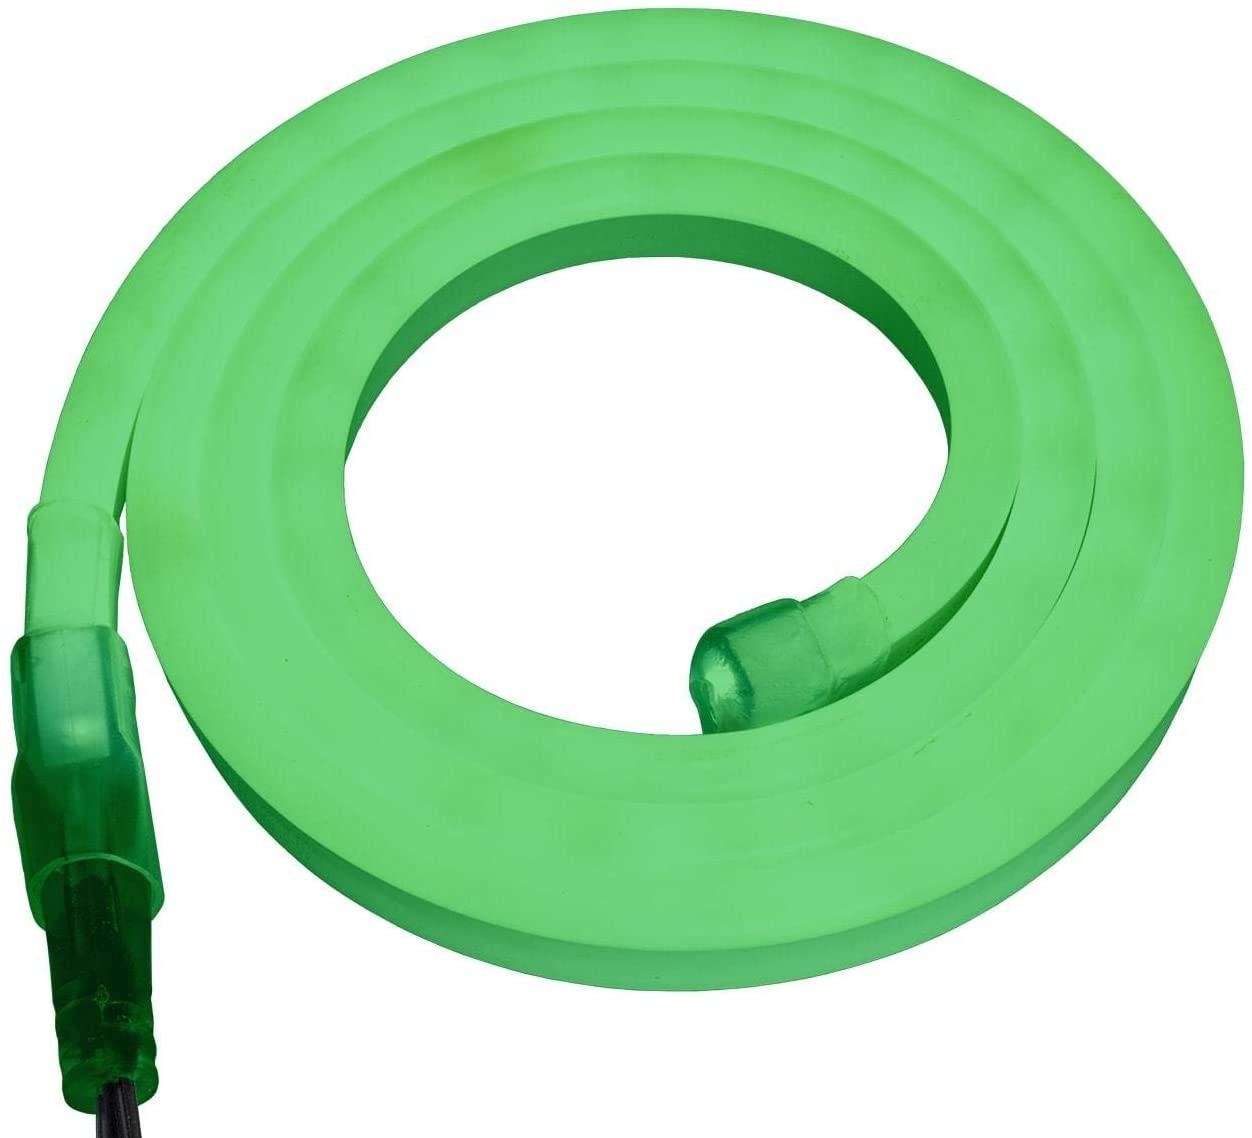 Brilliant Brand Lighting Green SMD LED Neon Strip Light - 120 Volt - Custom Cut - 36.08 Feet